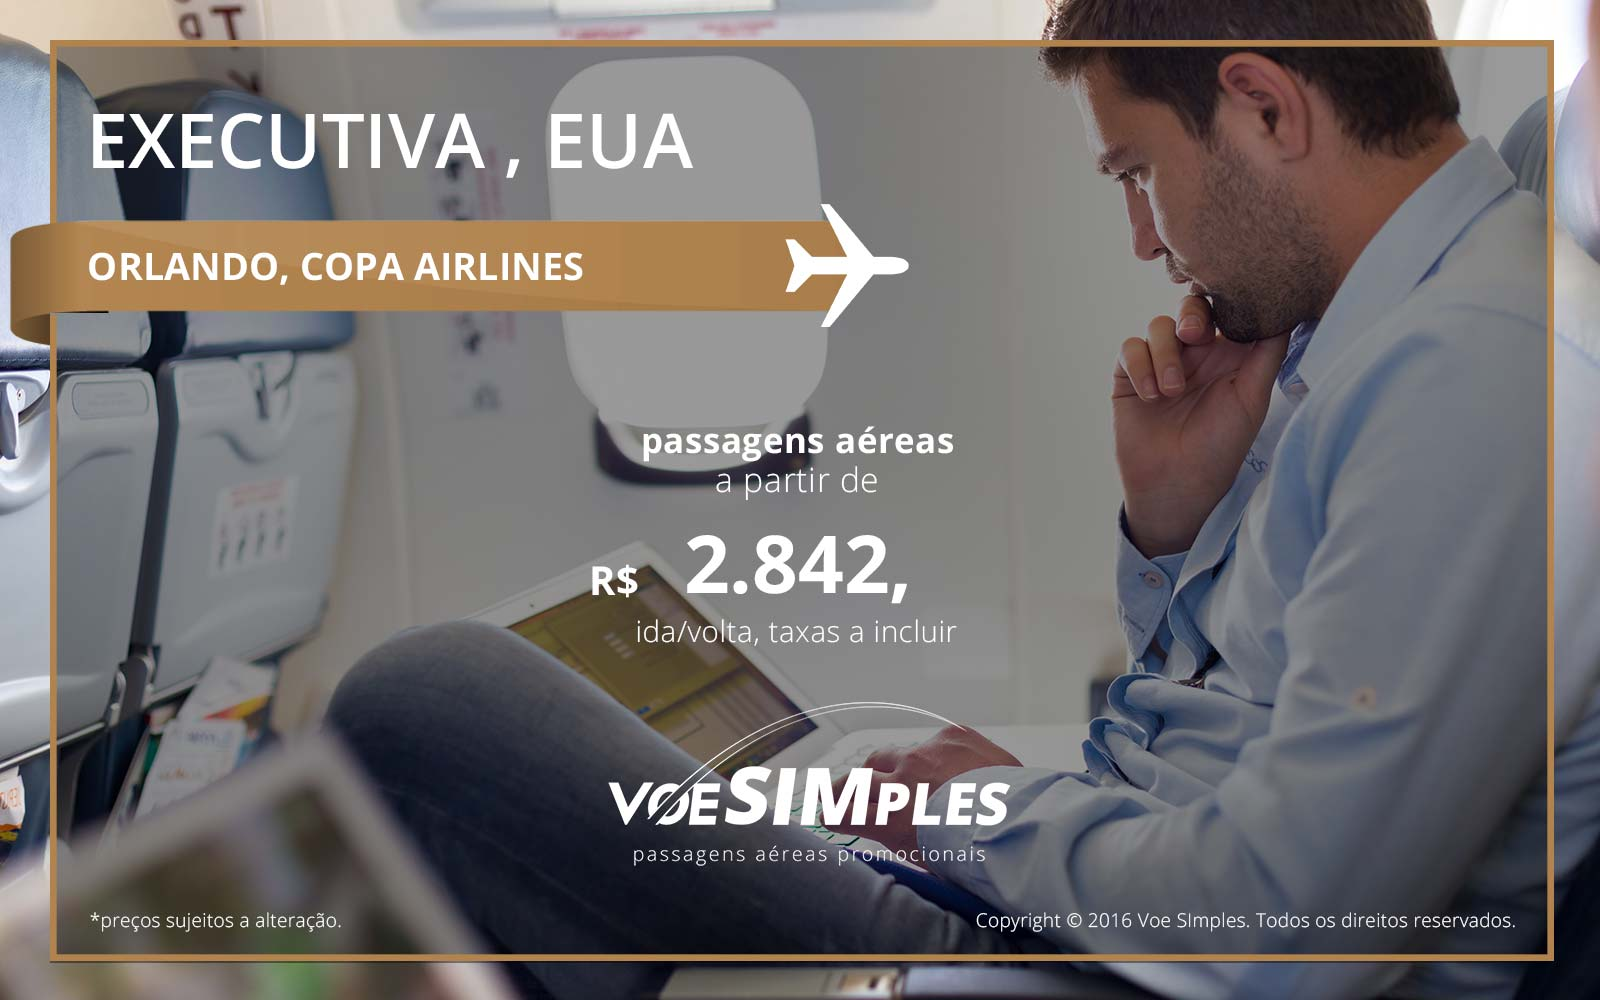 Passagem aérea Classe Executiva Copa Airlines para Orlando